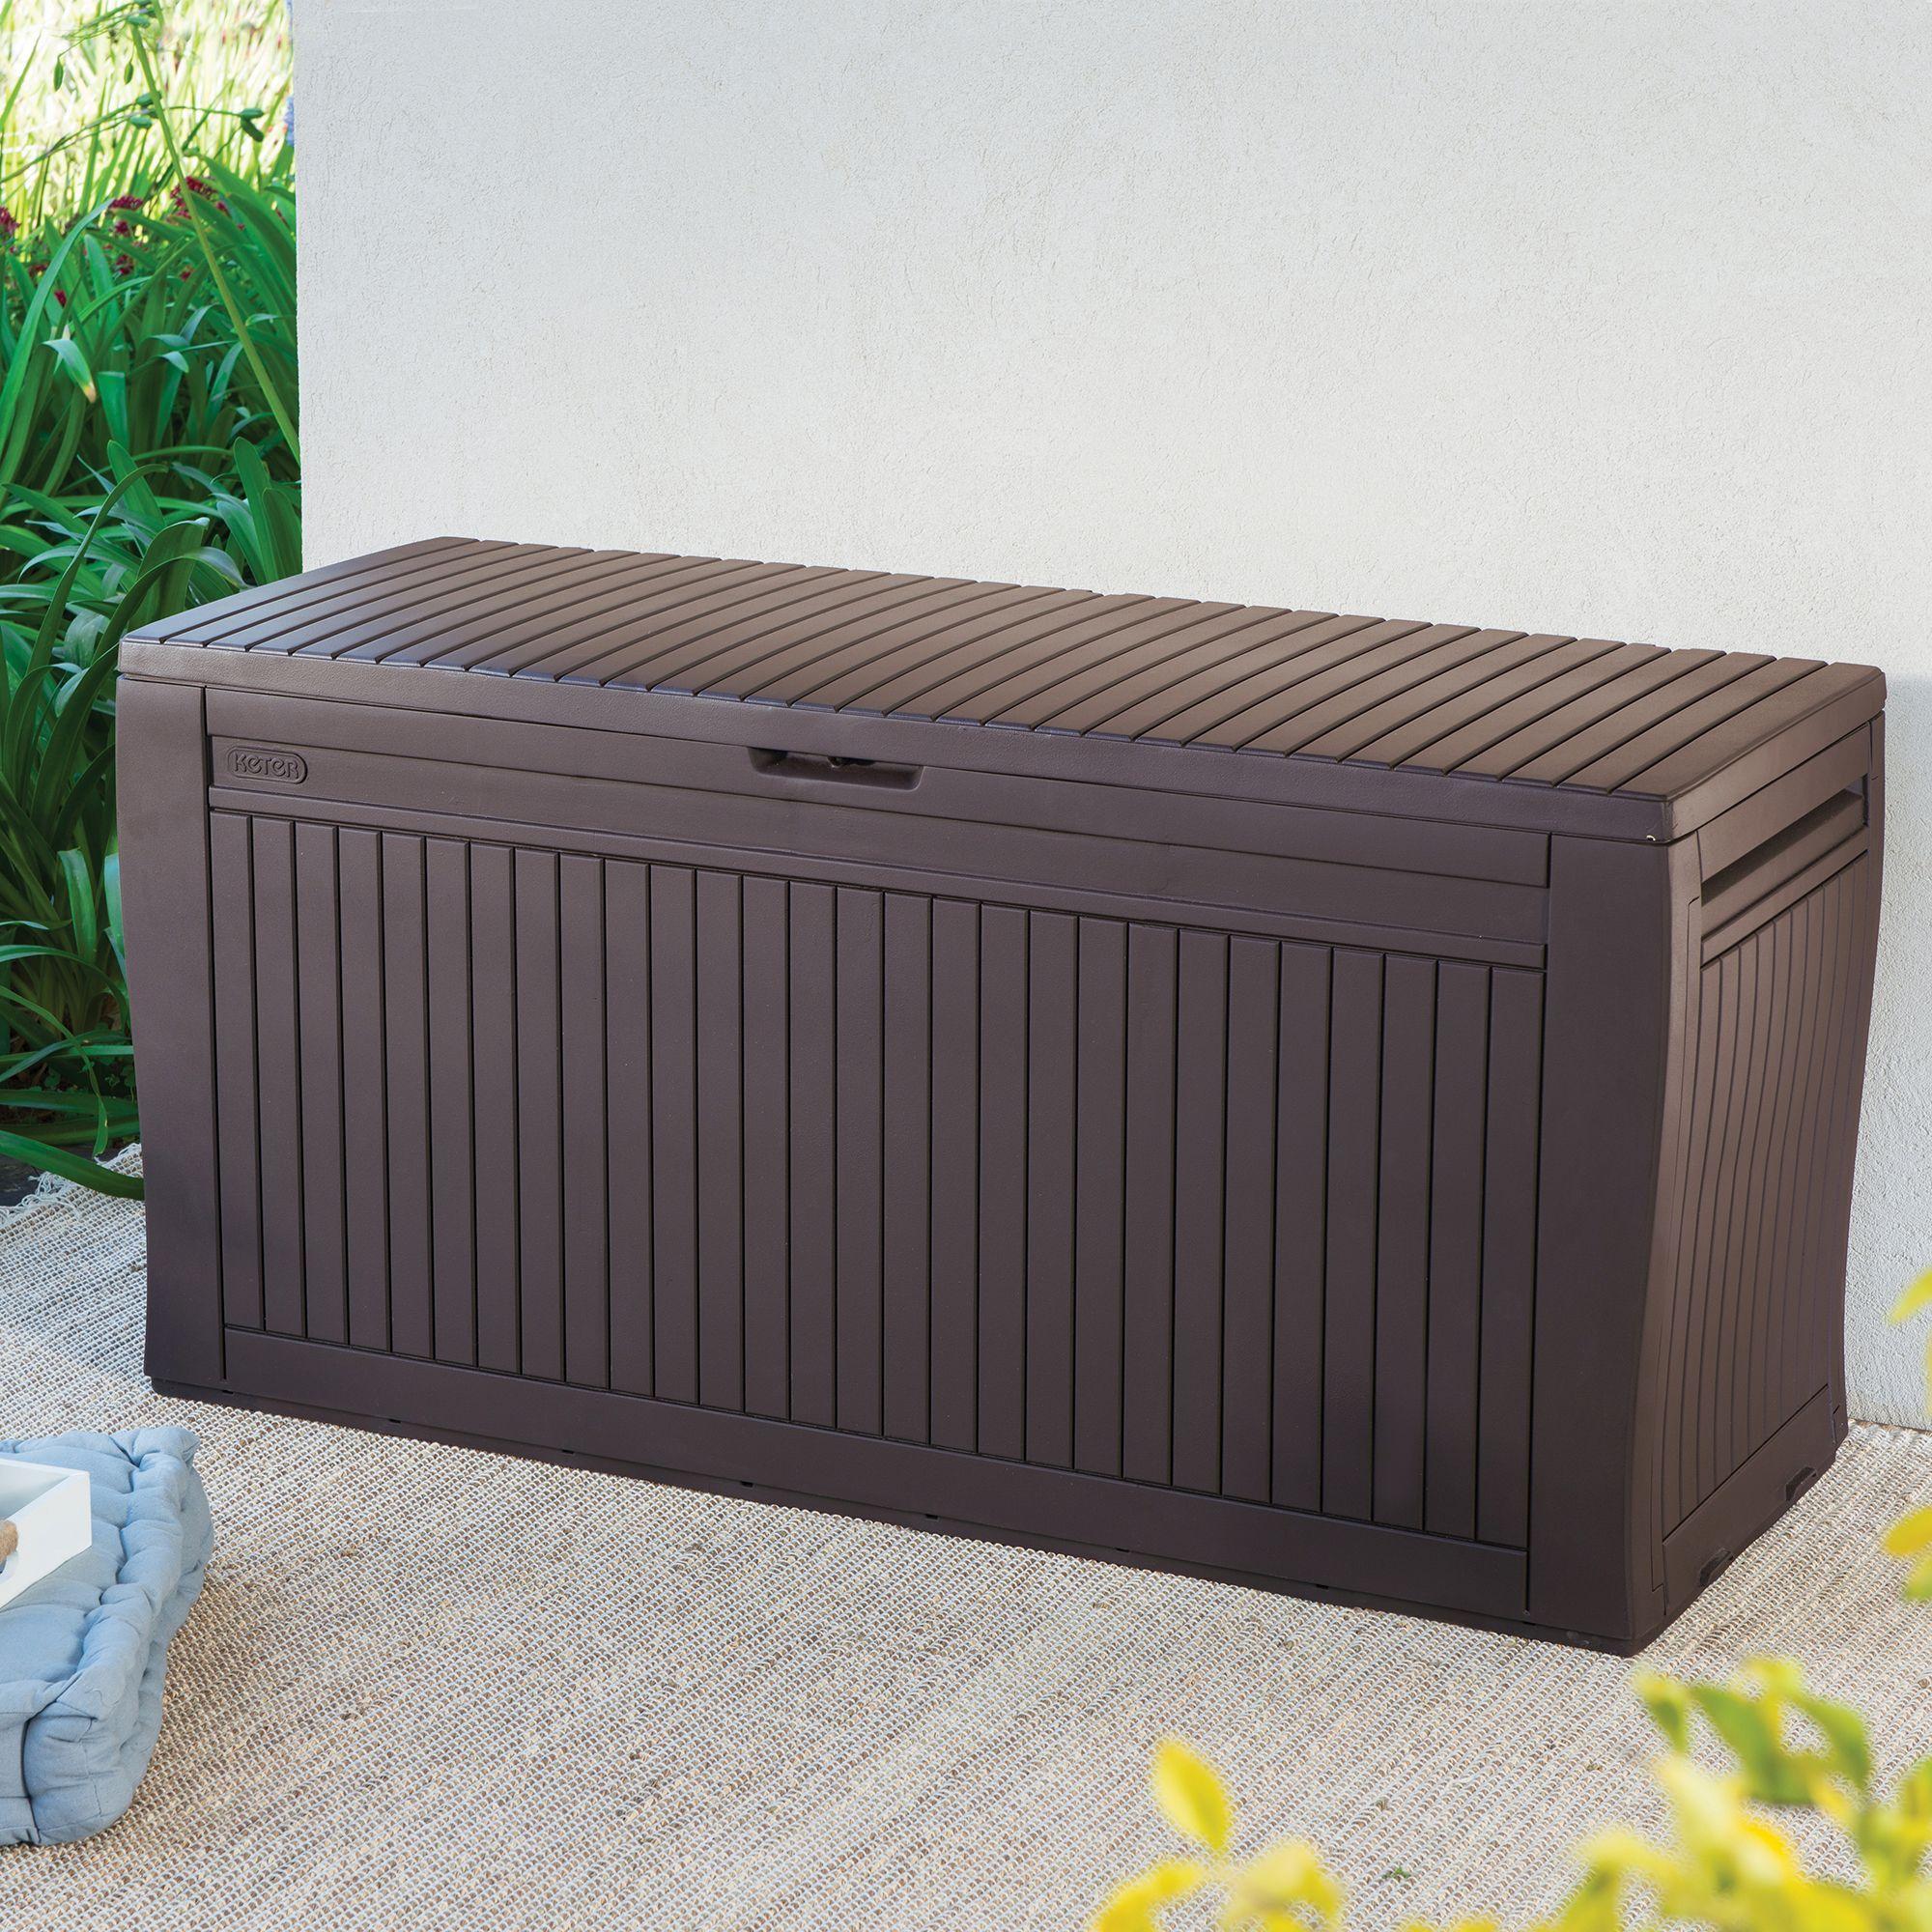 Comfy Wood Effect Plastic Patio Storage Box Departments Diy At B Q